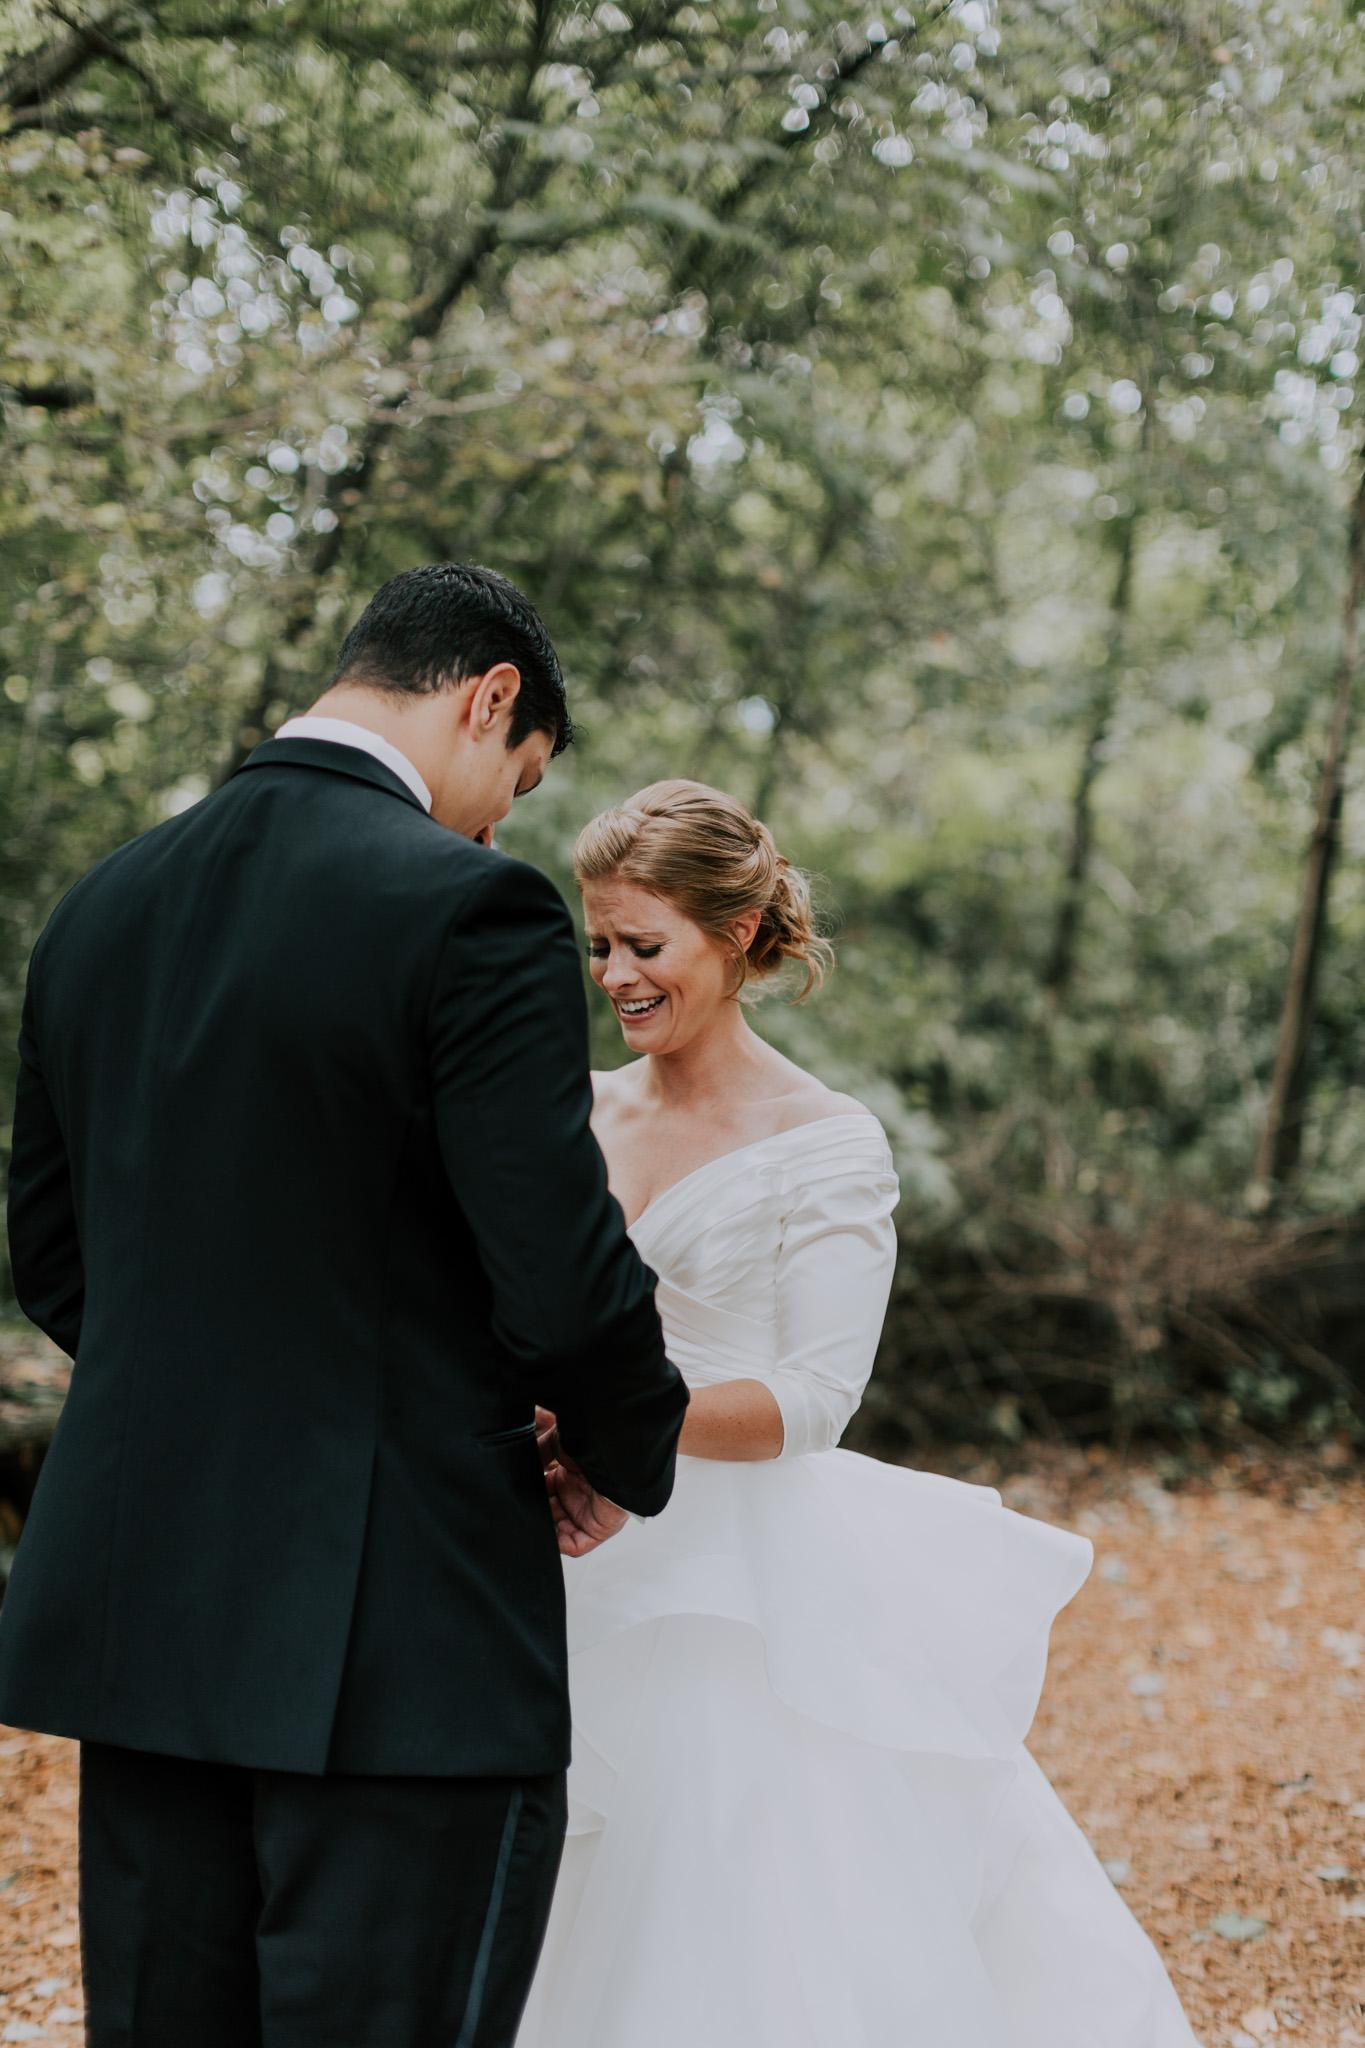 MillCreek-Wilde-Wedding-Barn-Michigan-Eliza-Eric-Vafa-Photo310.jpg